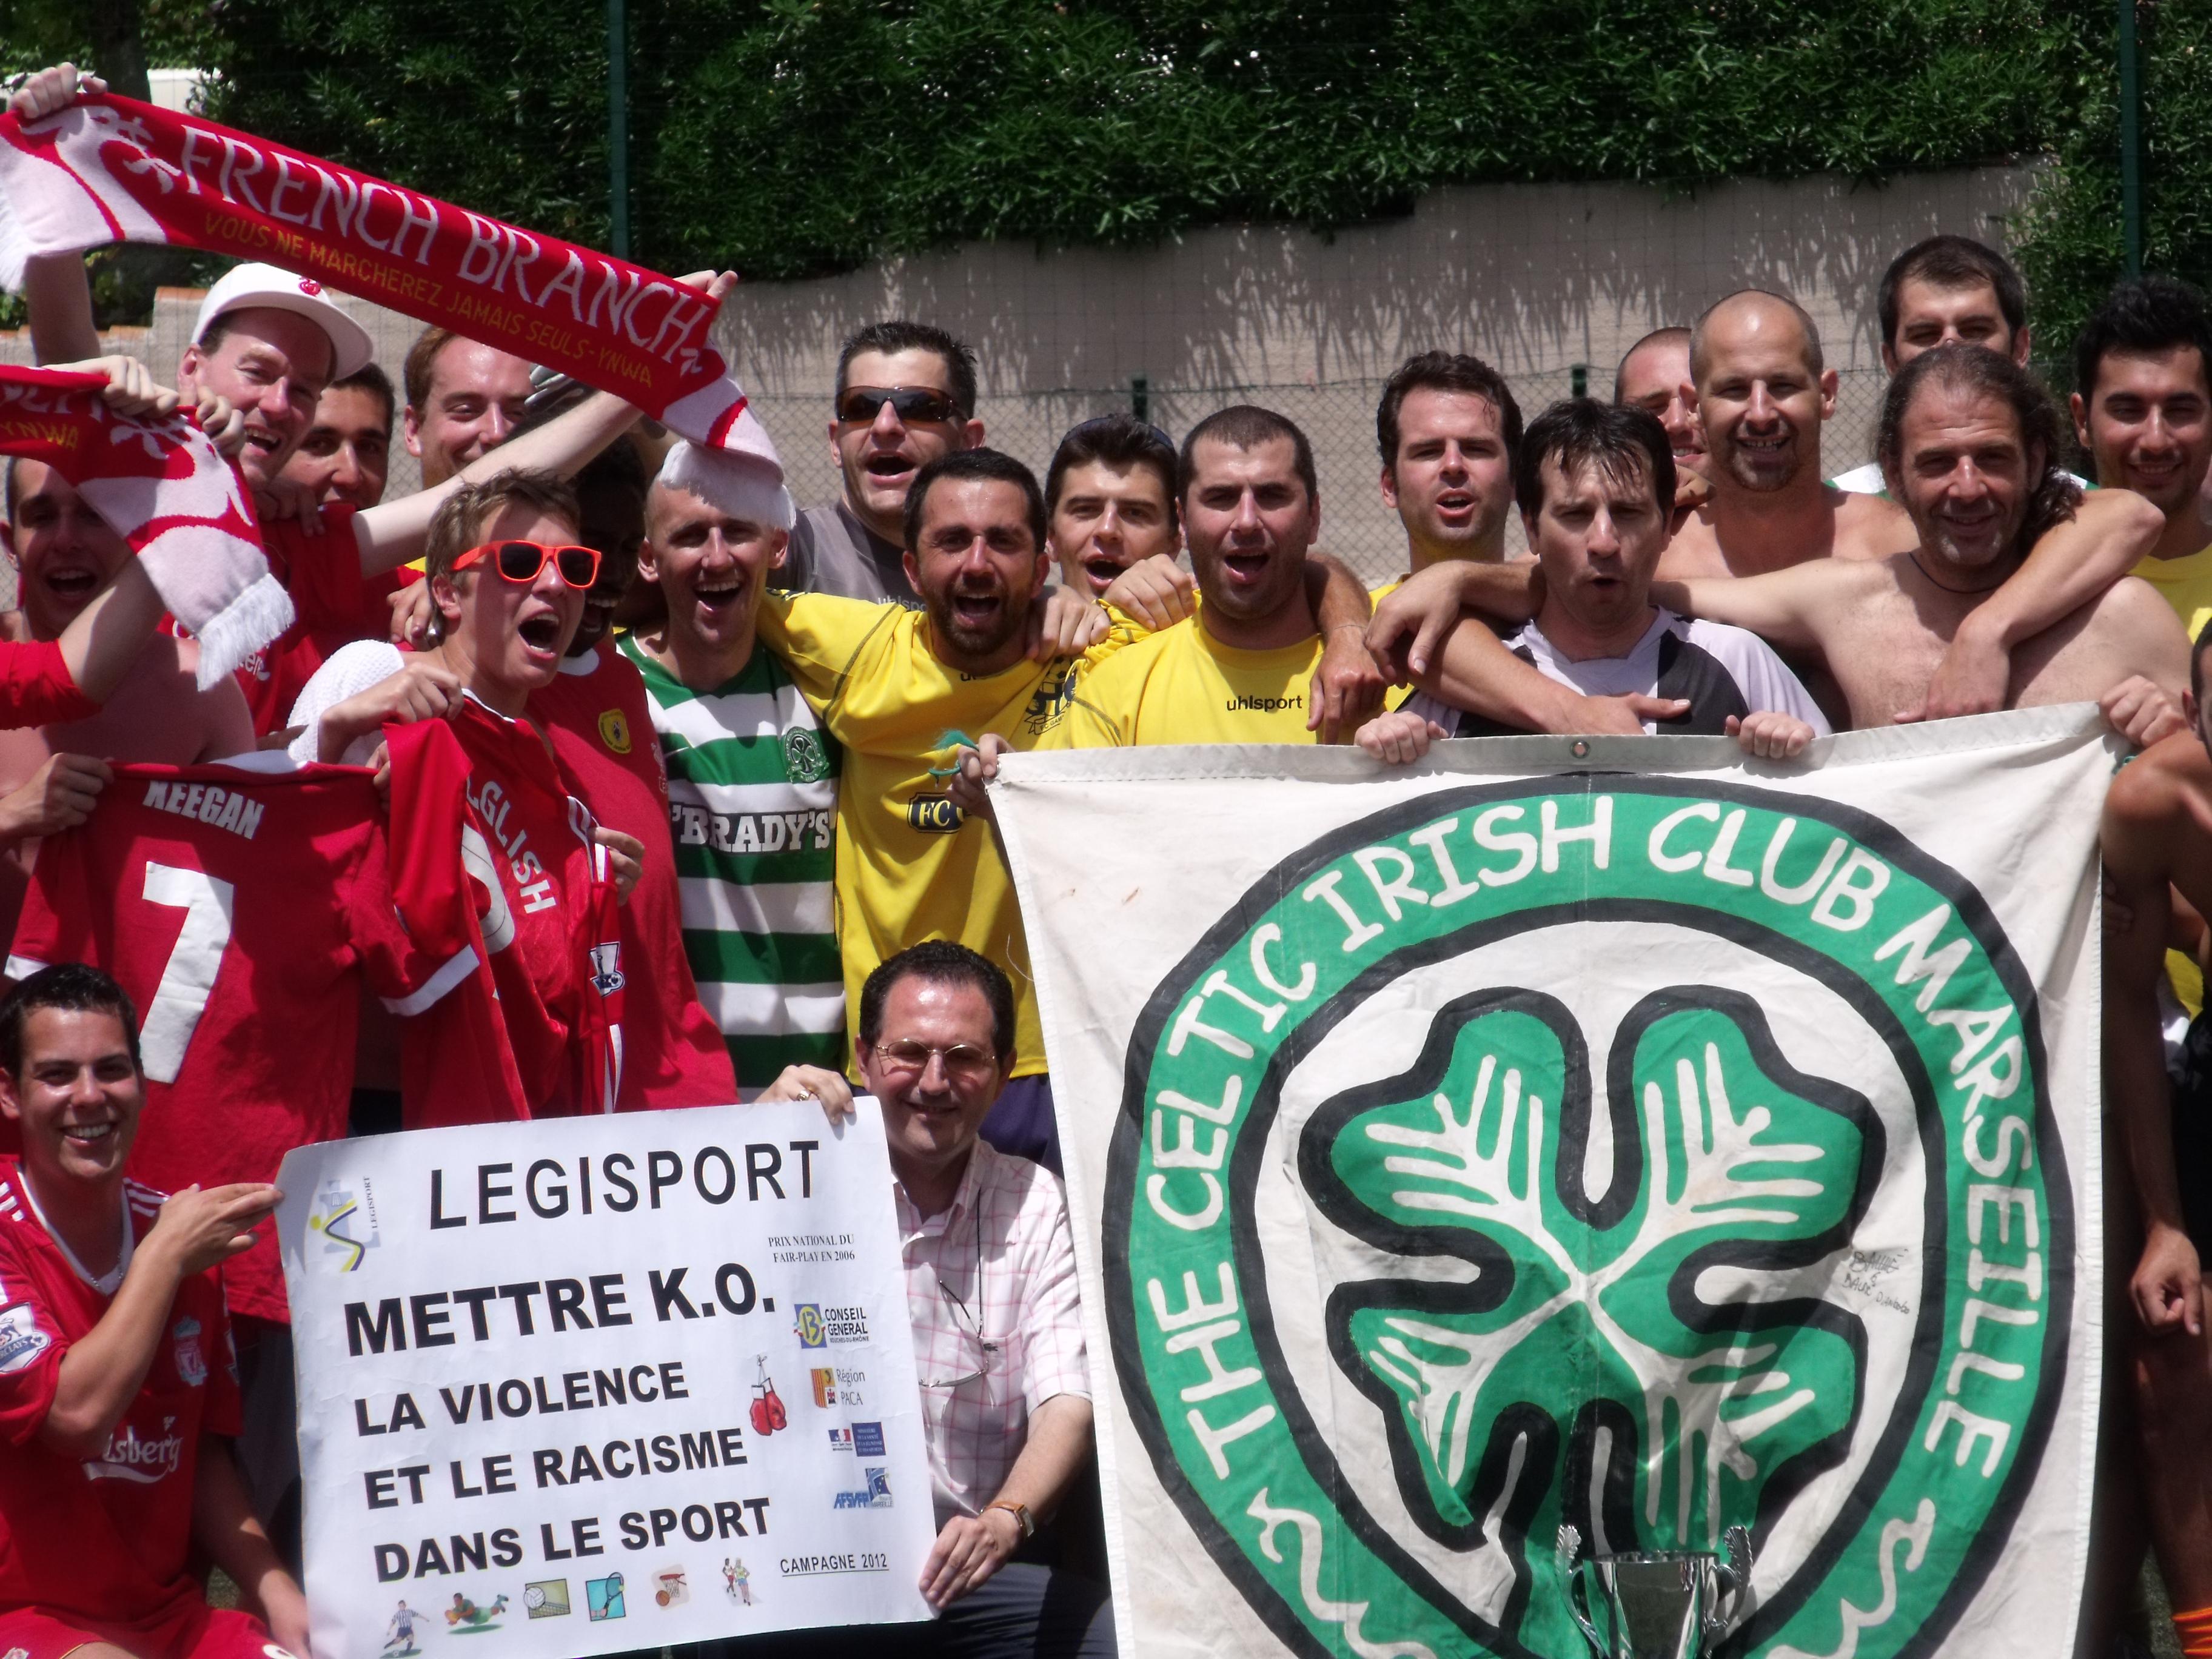 http://www.celtic-irish-club.com/wp-content/uploads/2012/06/DSCF4366.jpg